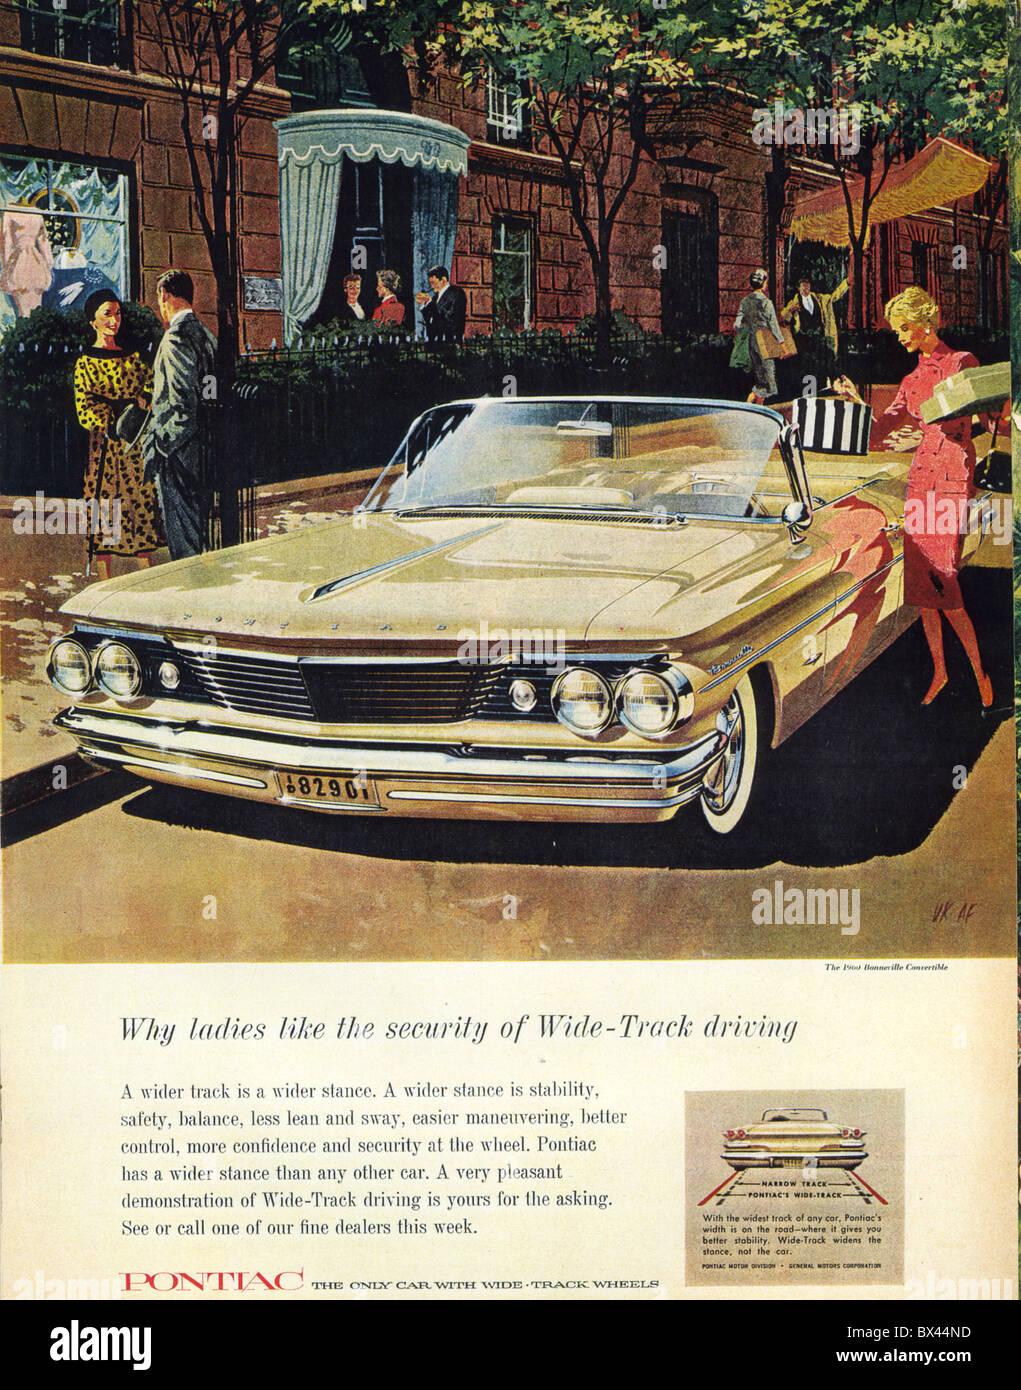 Pontiac Stock Photos Images Alamy 1960 Bonneville Station Wagon Convertible Advert Image